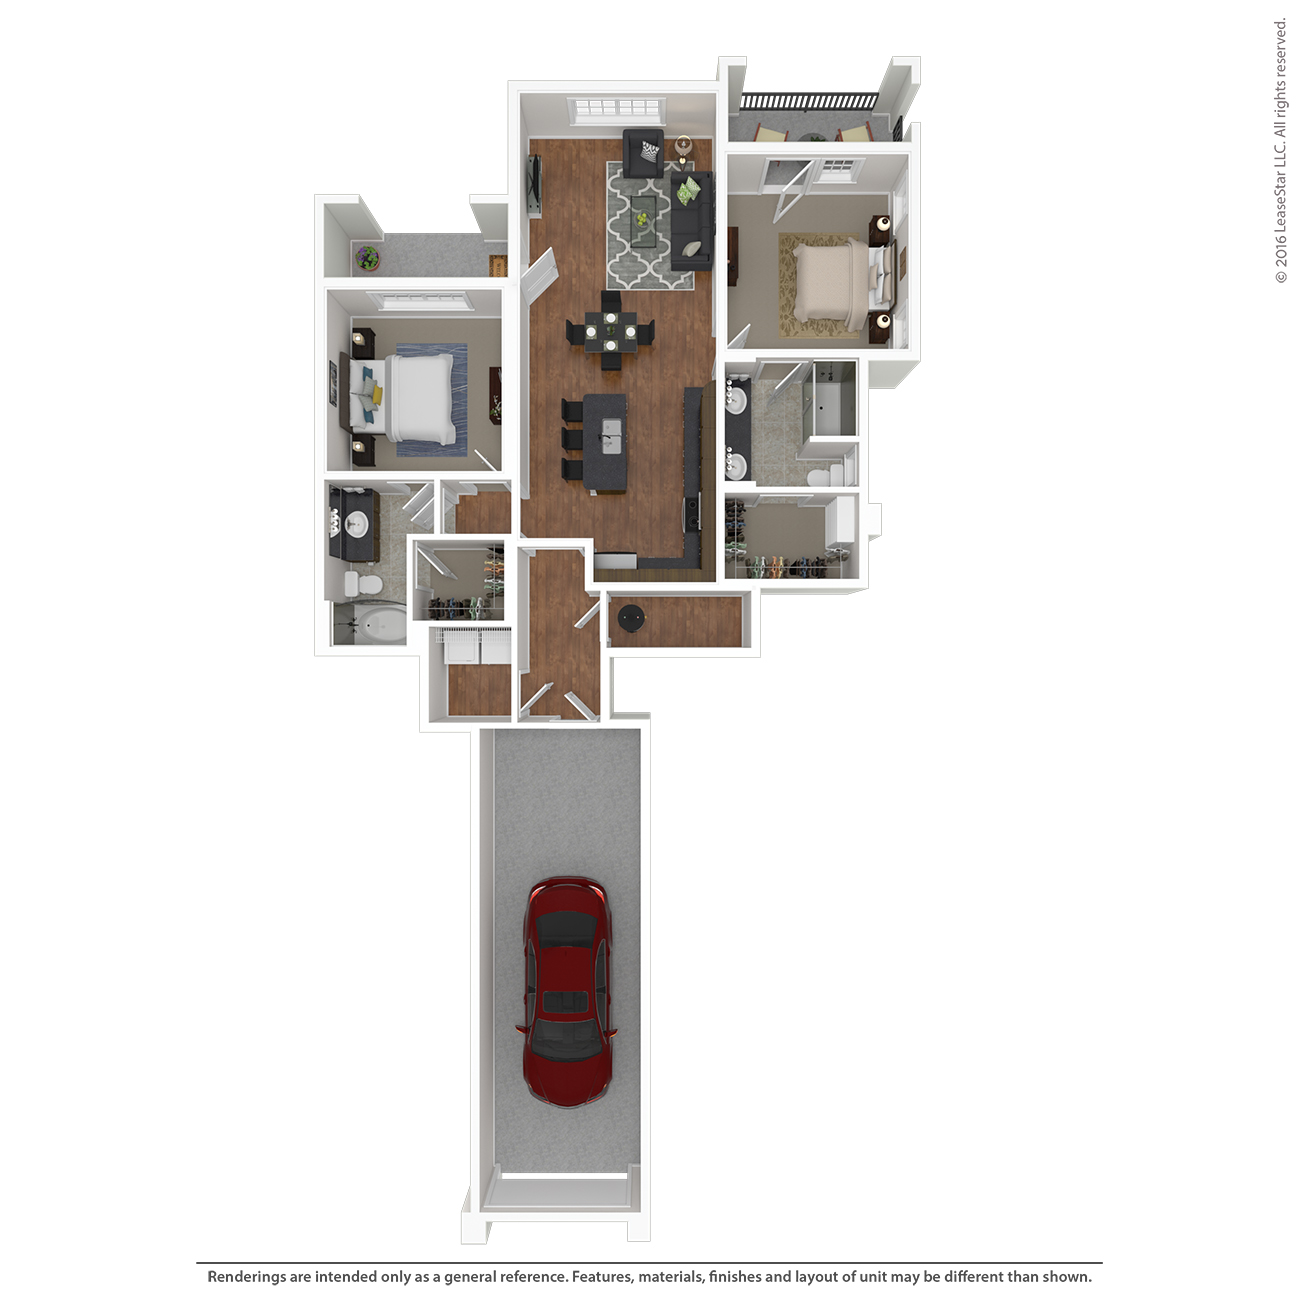 Savannah West - Floorplan - C1